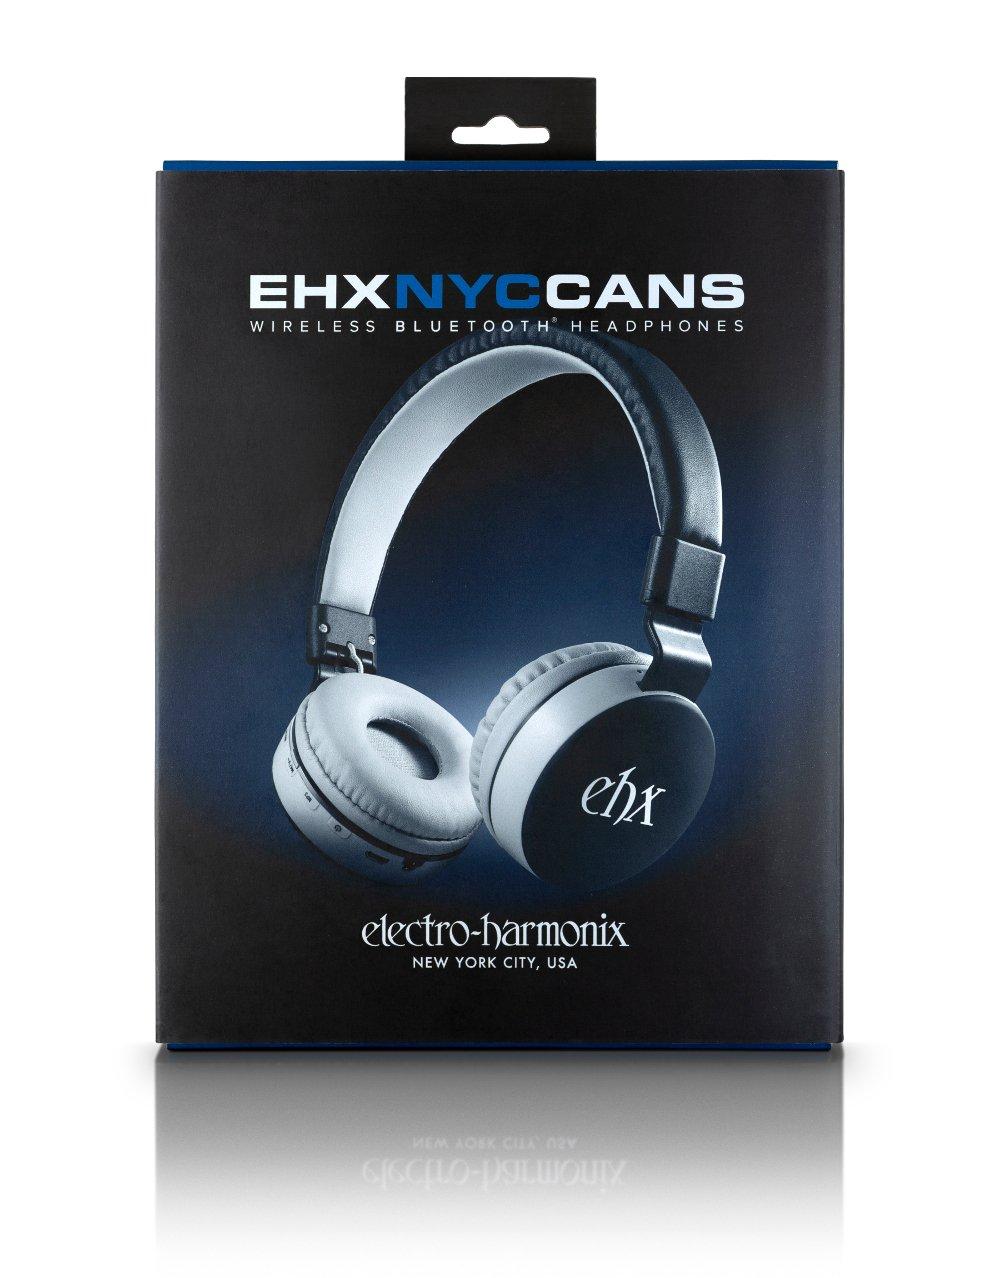 EHX NYC CANS BLUETOOTH HEADPHONES